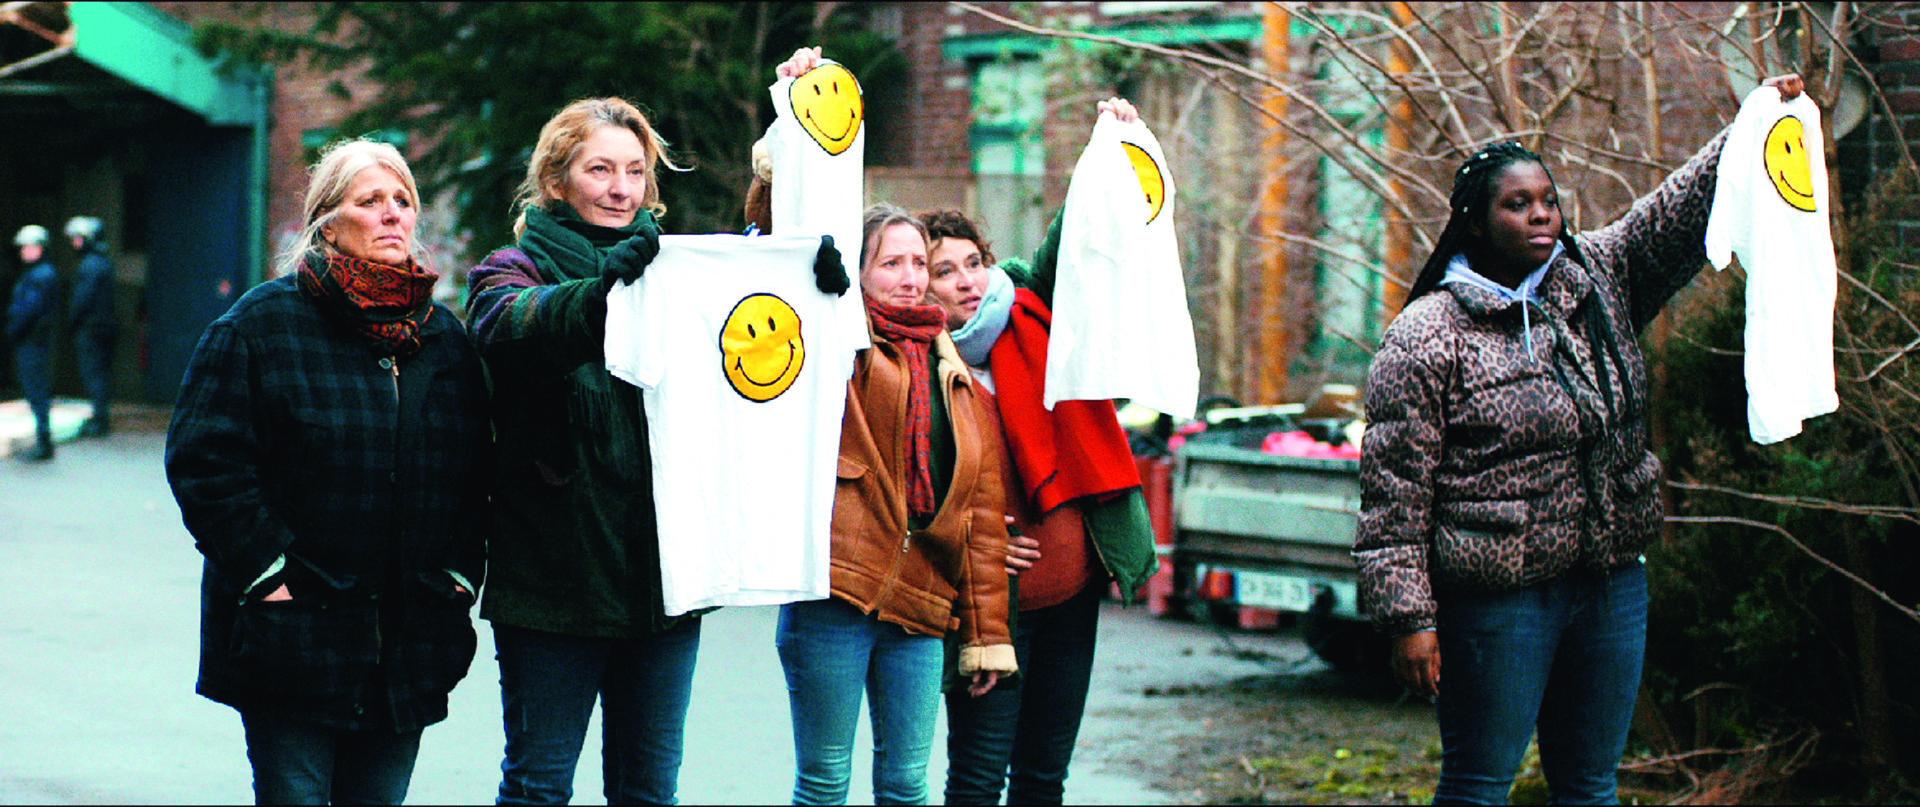 Der Glanz der Unsichtbaren 3 - Filmtipps Oktober